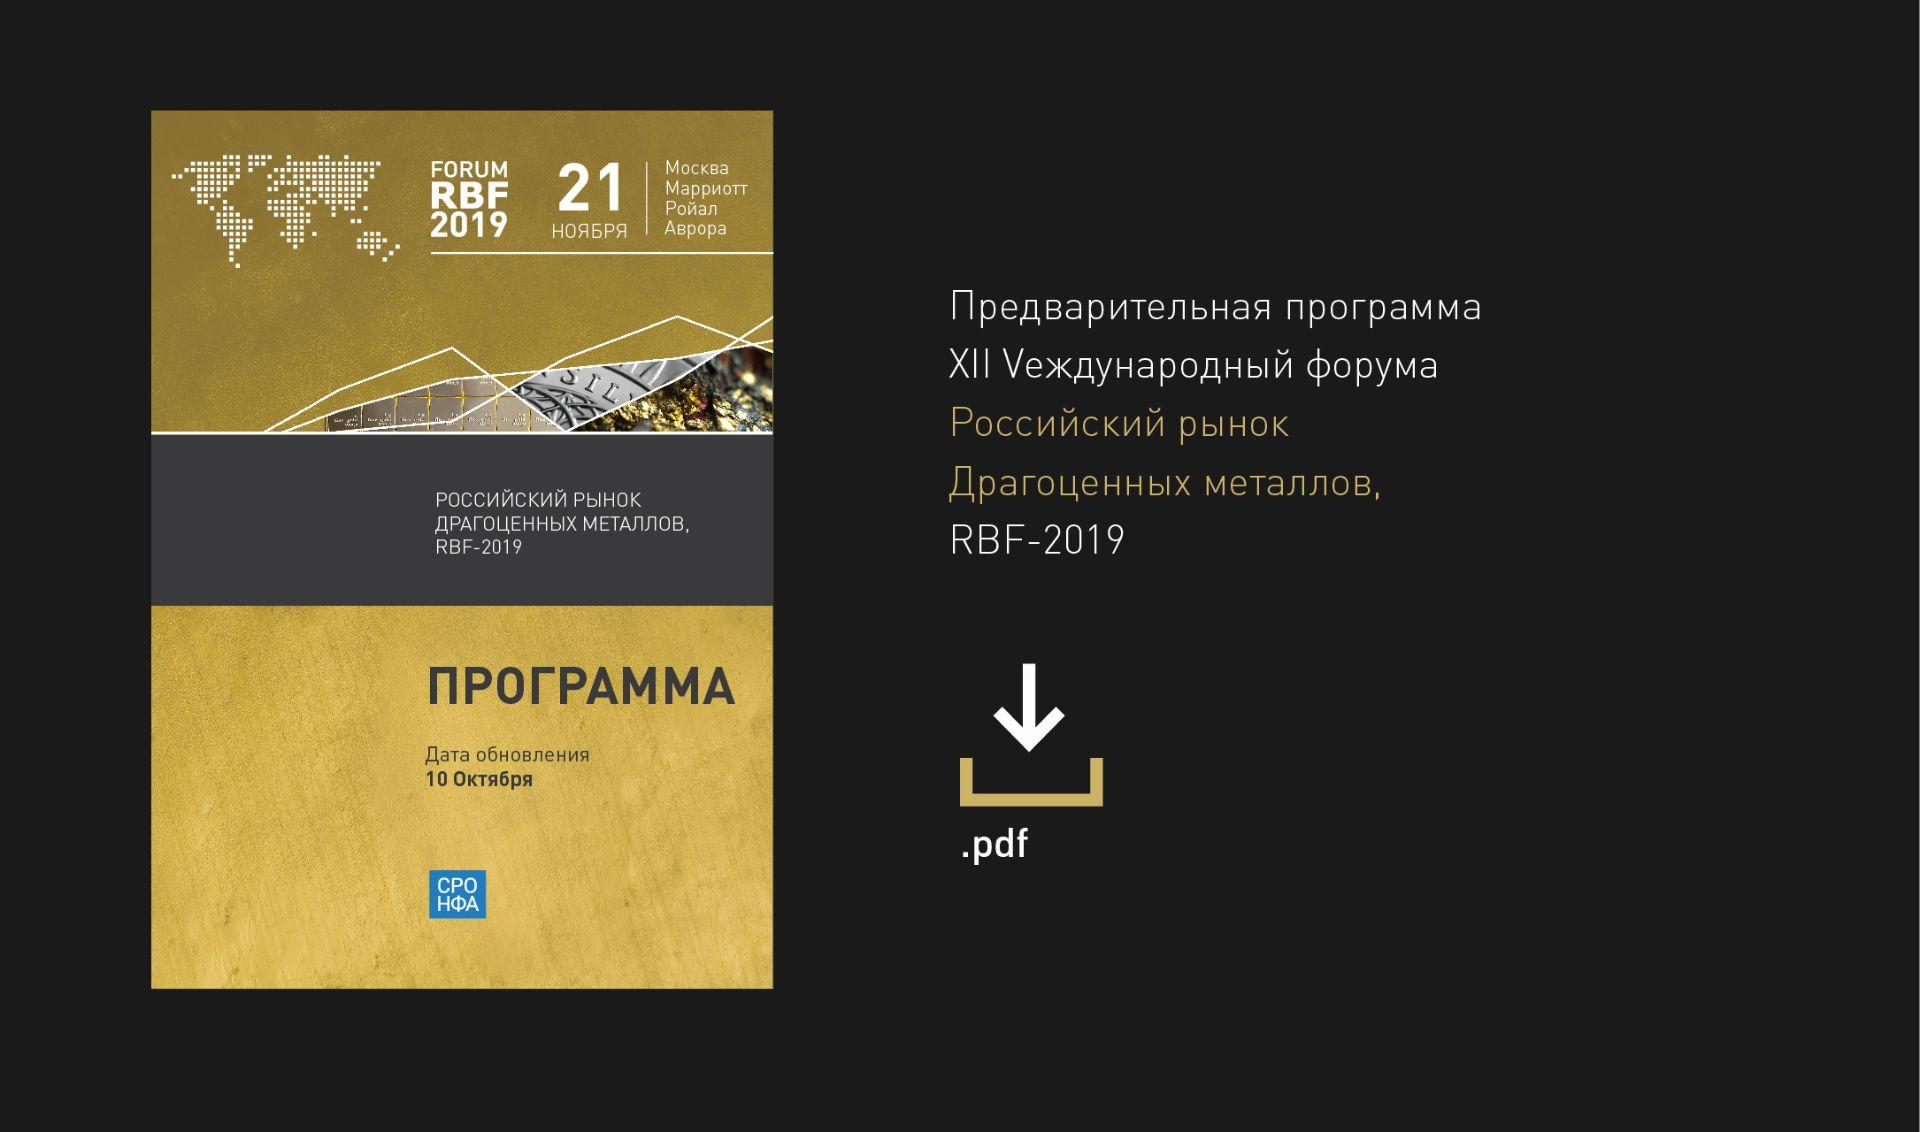 Предварительная программа форума РБФ-2019